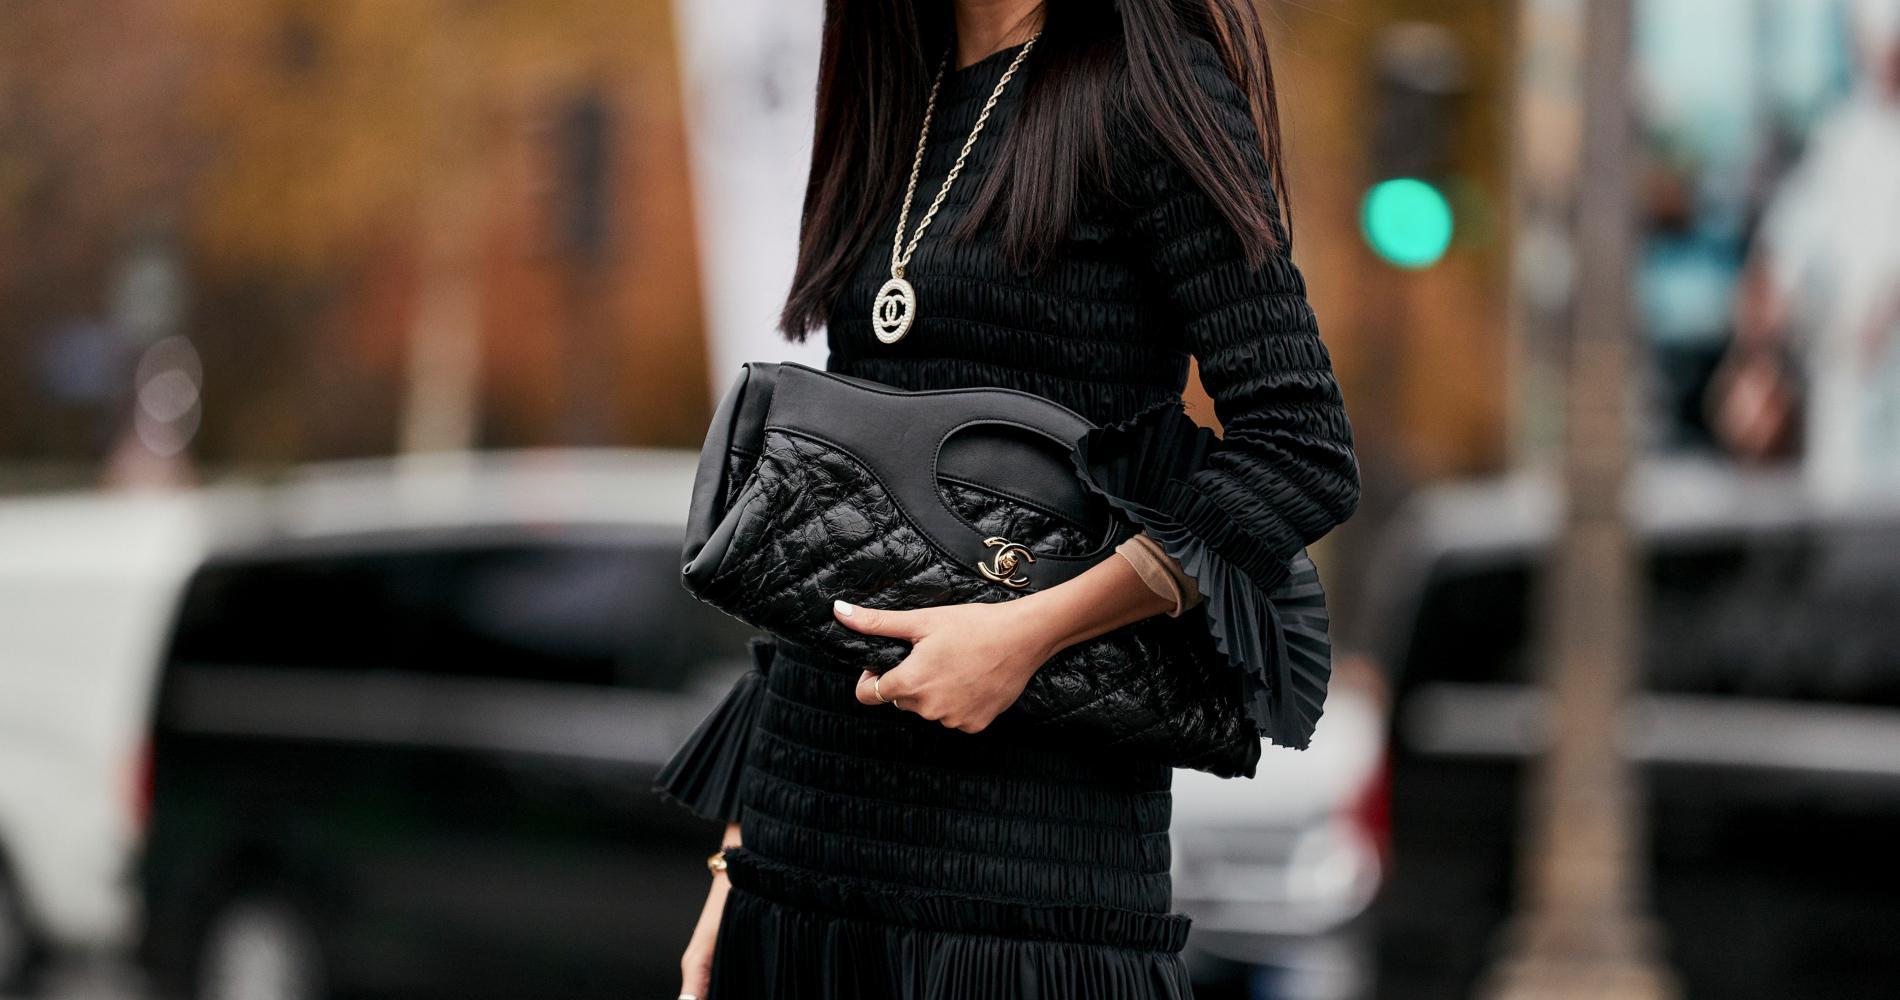 fac6a45805 Gabrielle, Boy, Timeless... Les sacs iconiques de Karl Lagerfeld ...